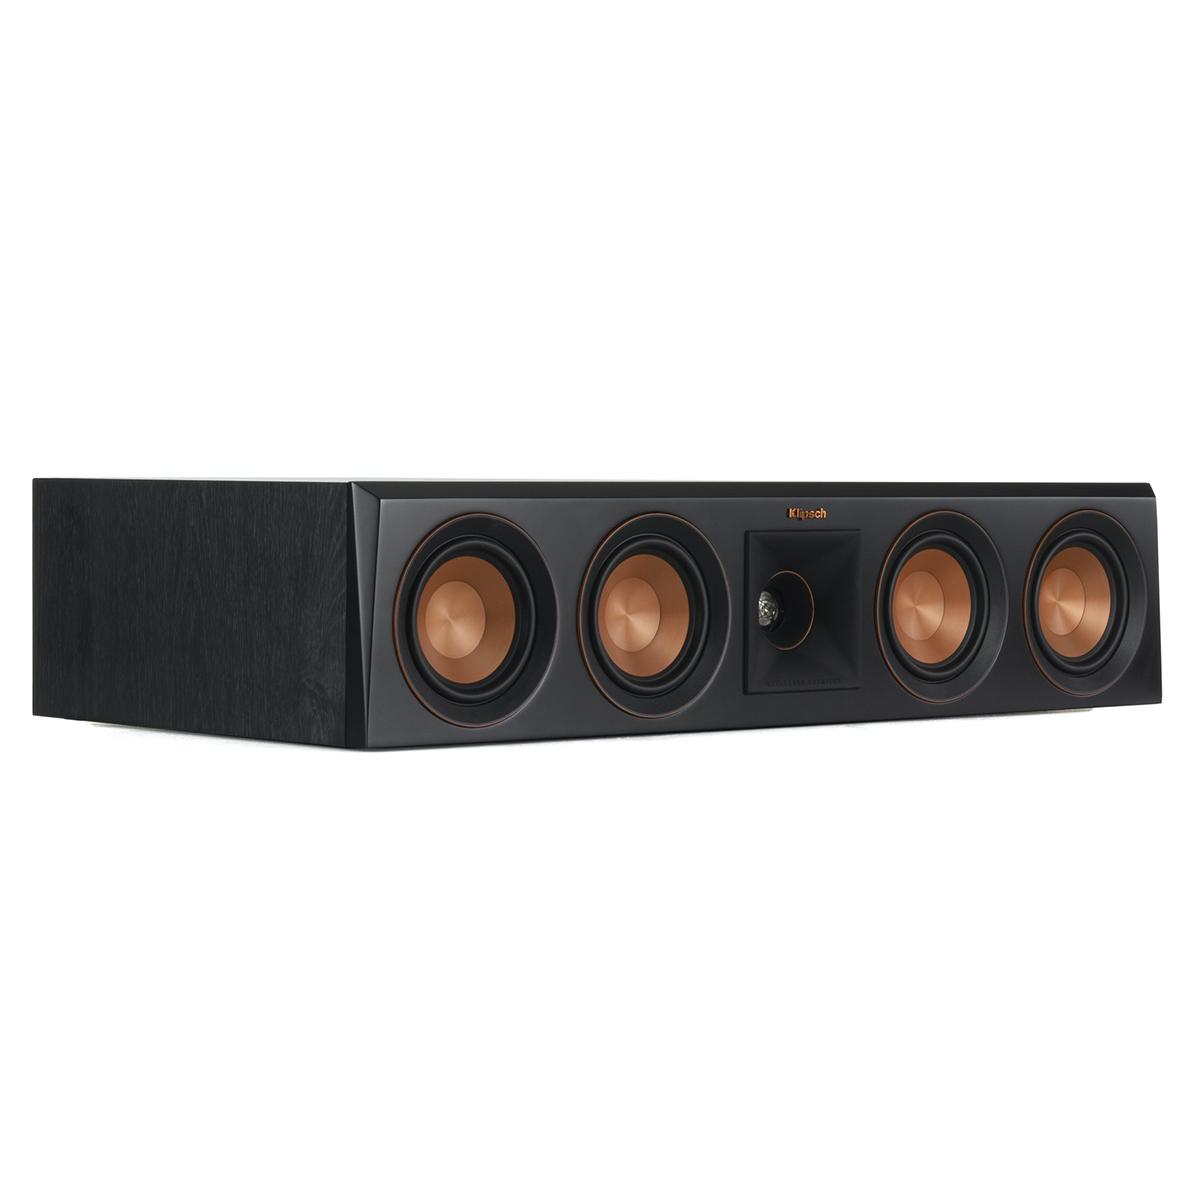 Klipsch Rp 404c Centre Speaker Ebony Life Style Store